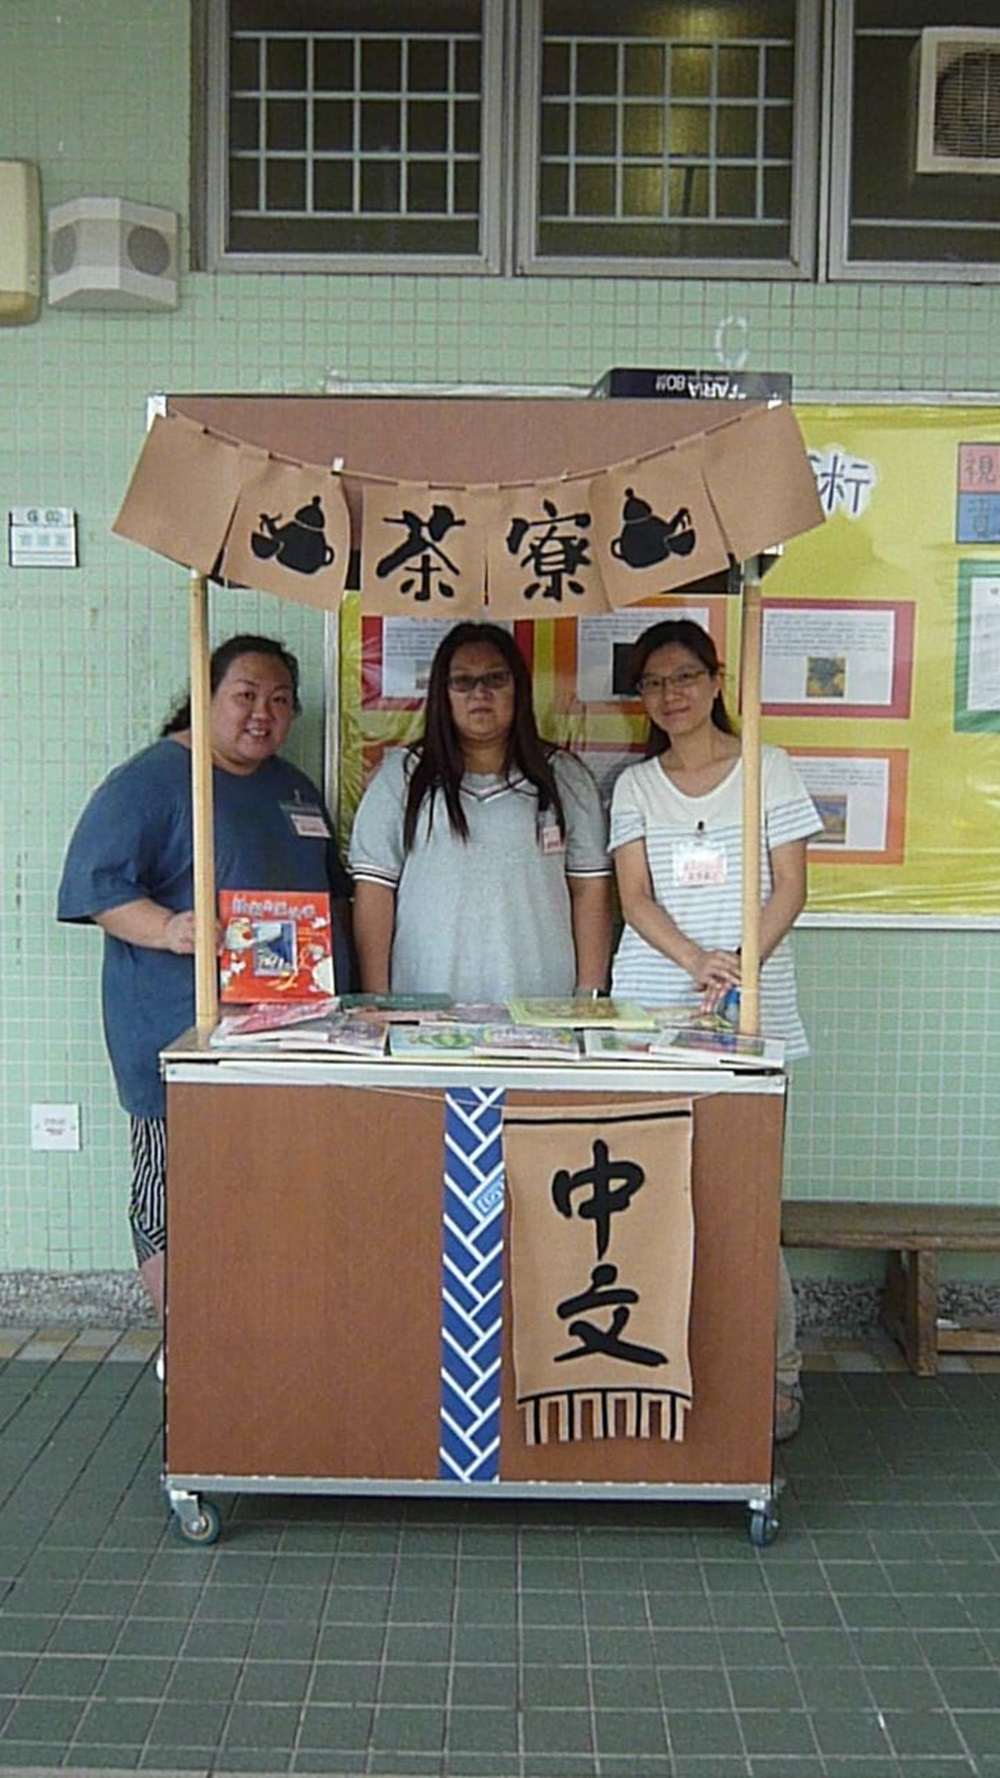 https://skhtswlo.edu.hk/sites/default/files/p1240242.jpg